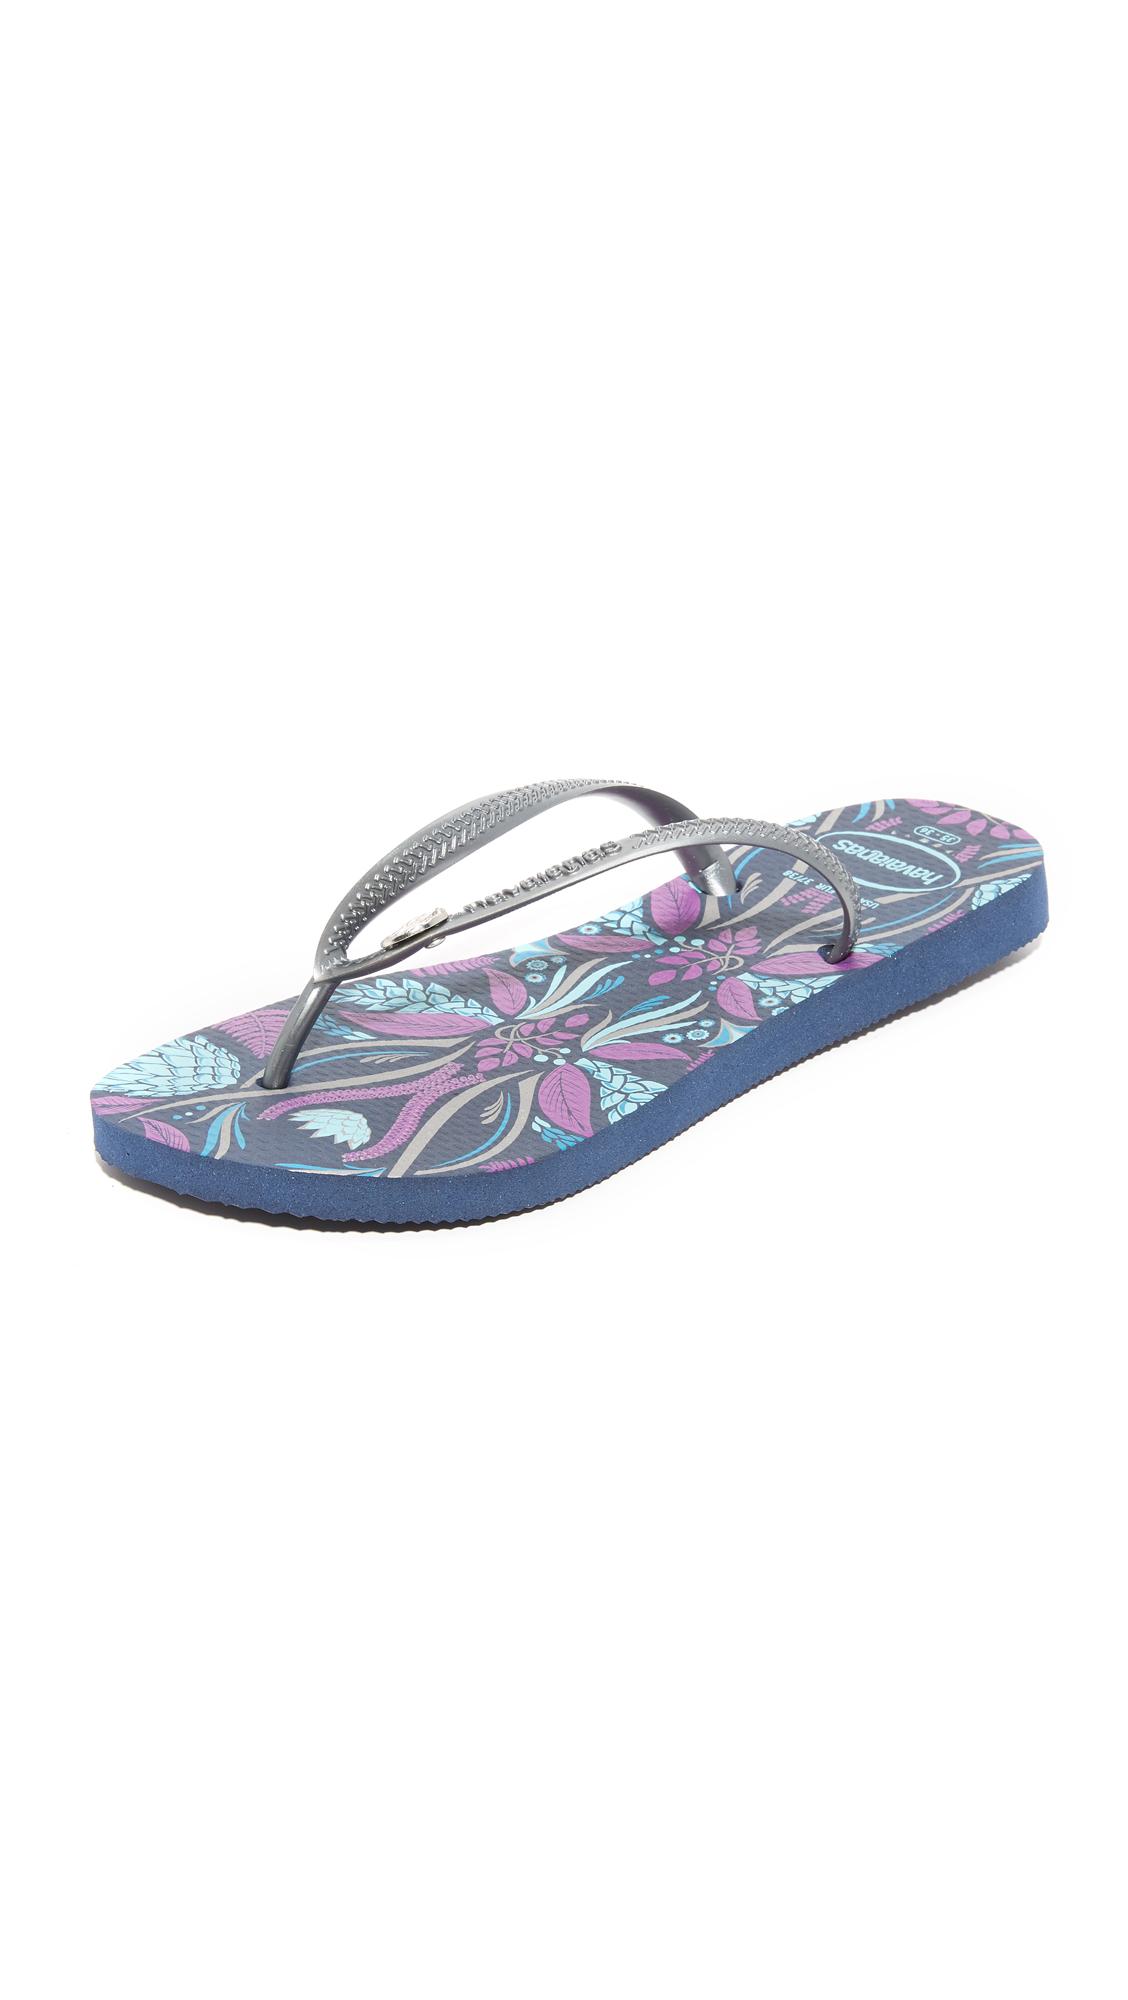 Havaianas Slim Royal Flip Flops - Navy Blue at Shopbop